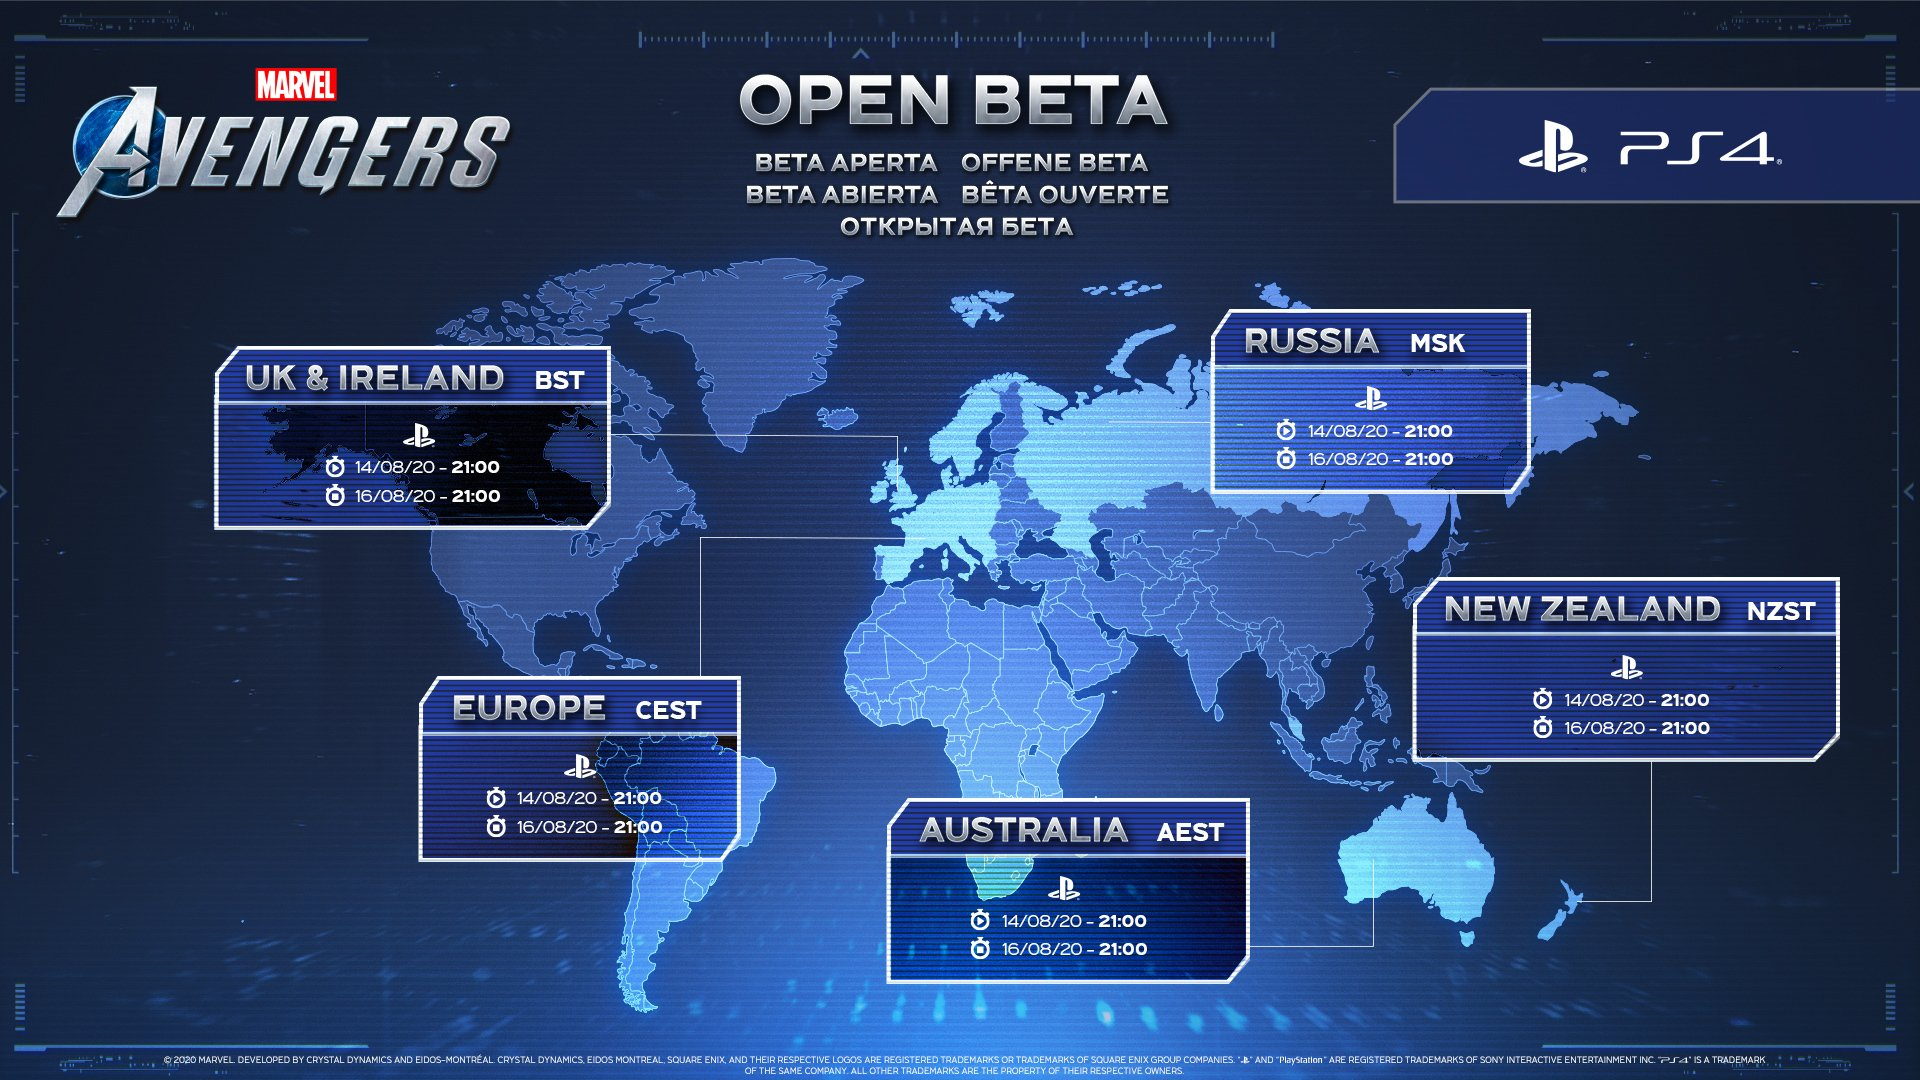 204345-Open%20beta.jpg